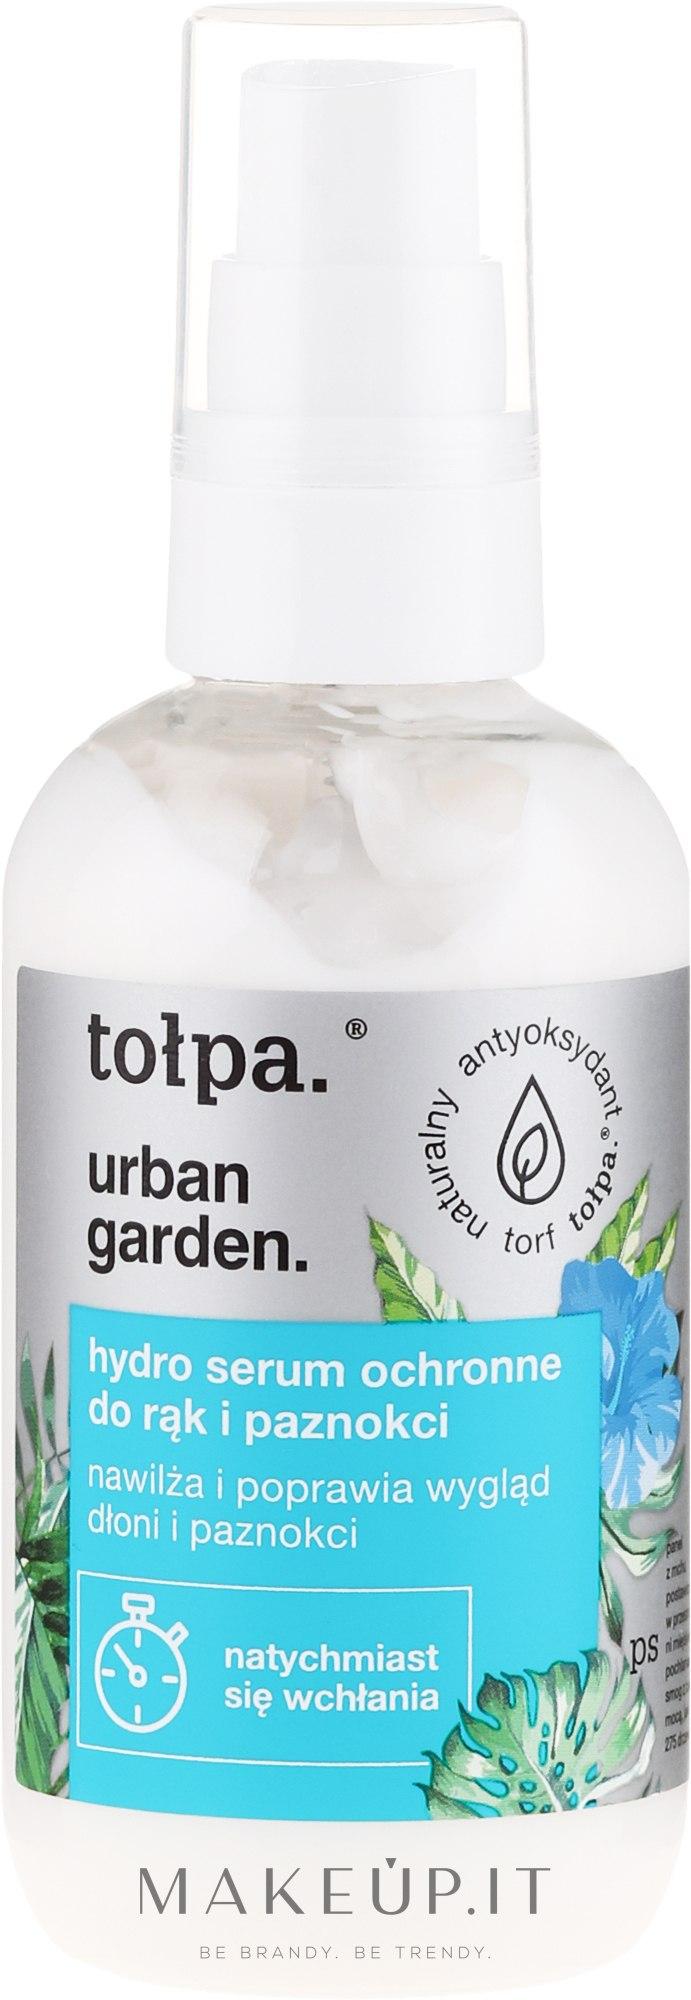 Siero mani e unghie - Tolpa Urban Garden Hand & Nail Hydro Serum — foto 100 ml